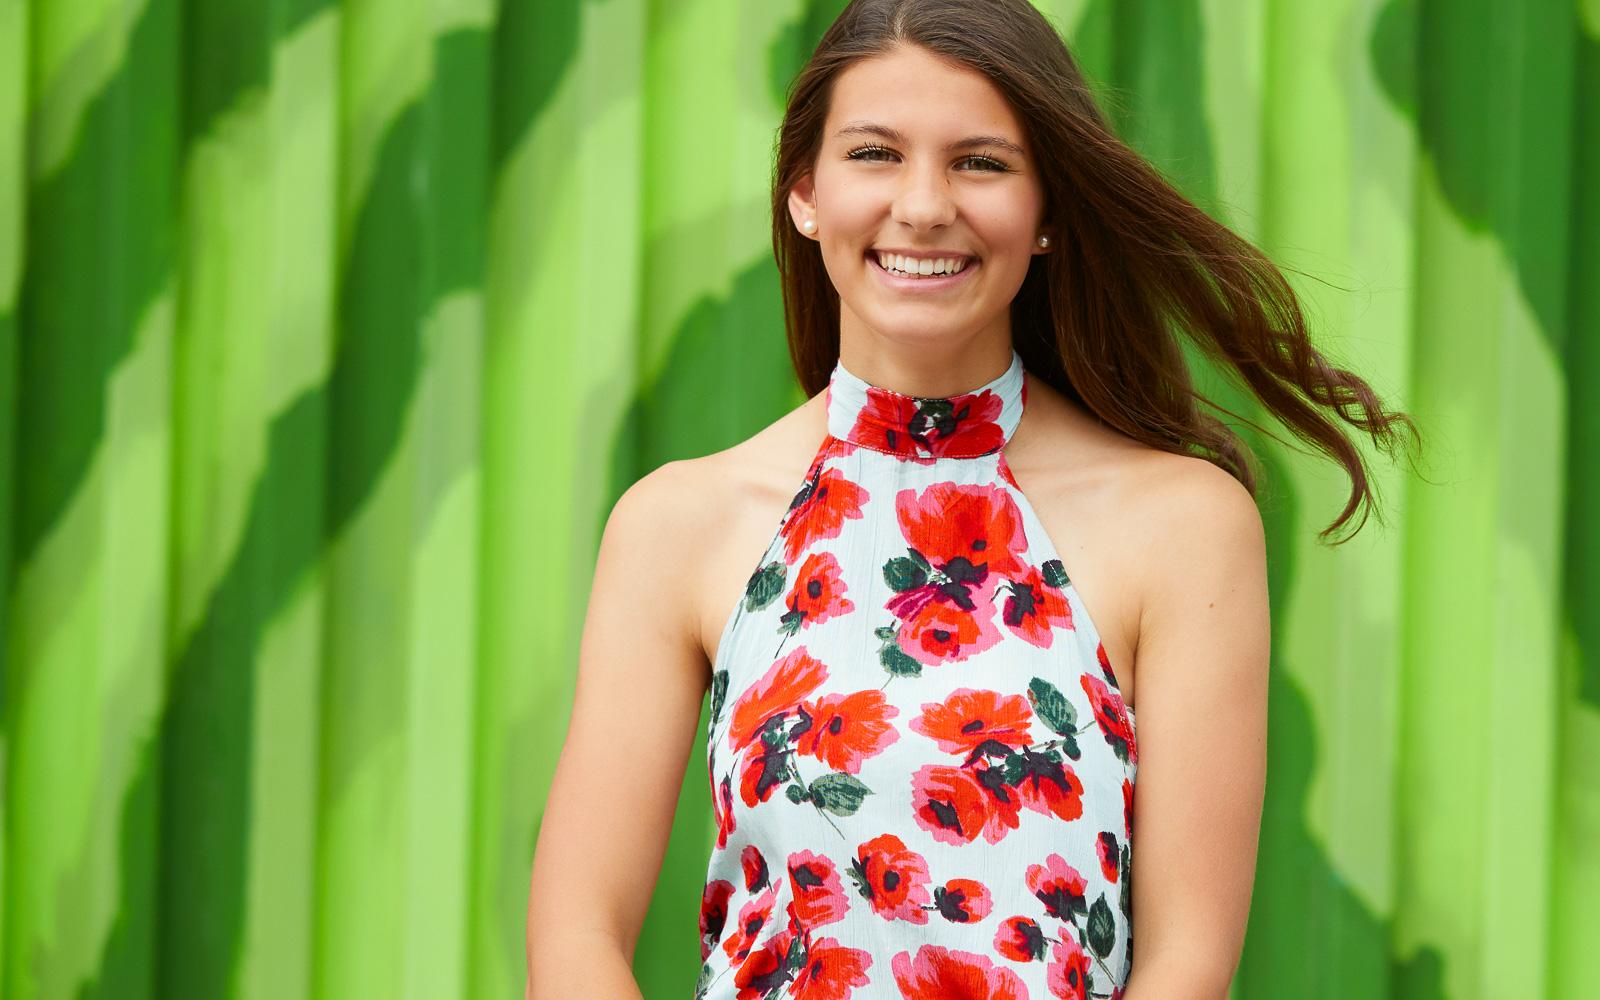 Senior girl photography Rochester MN | Olive Juice Studios -